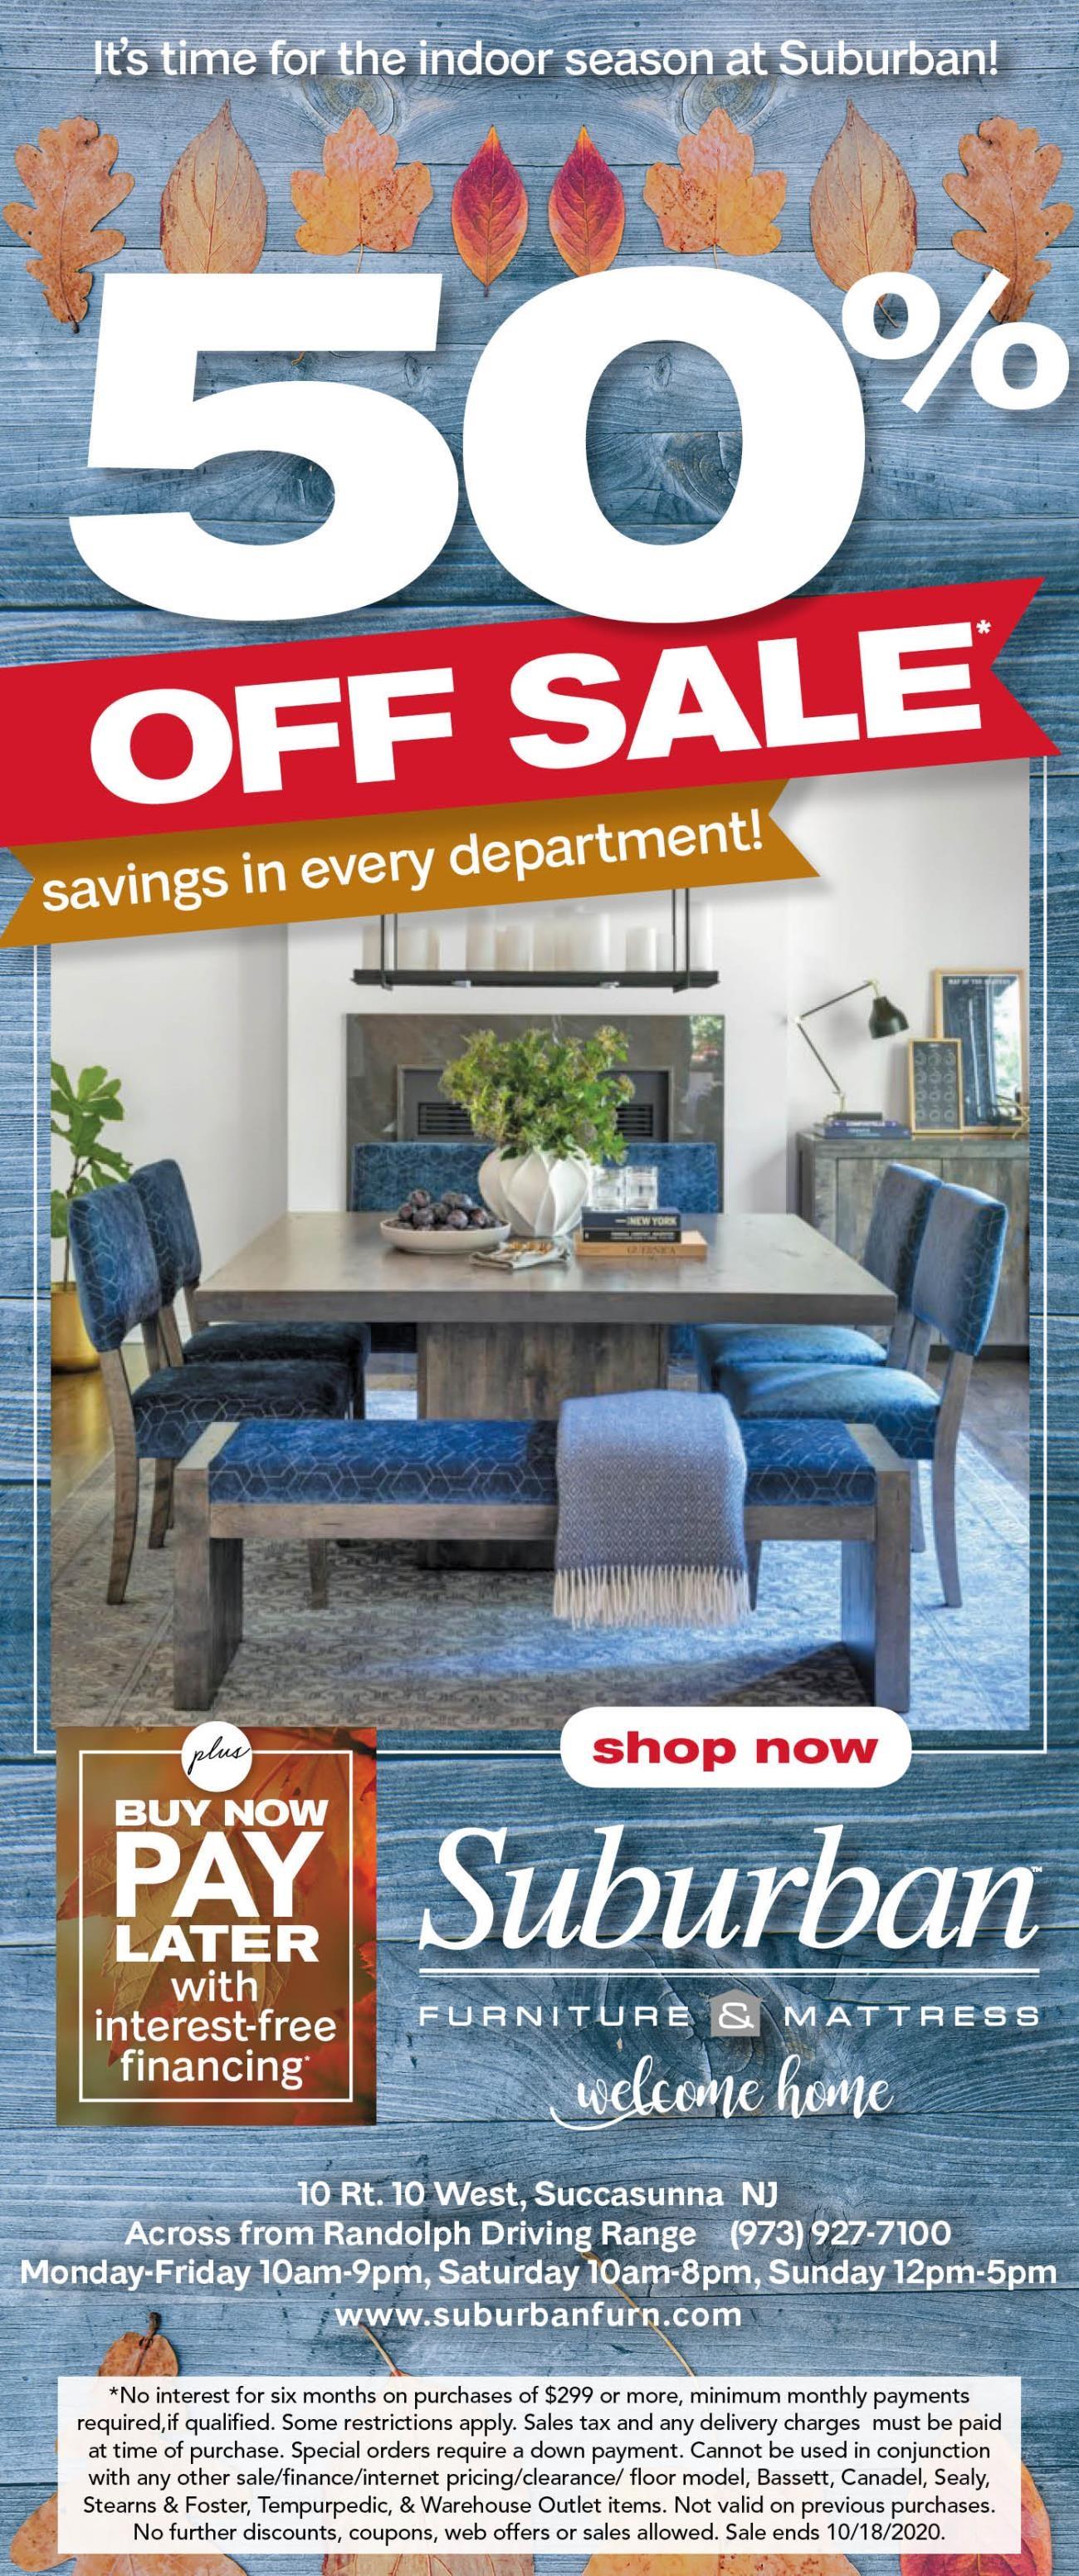 Suburban's fall 50% off sale